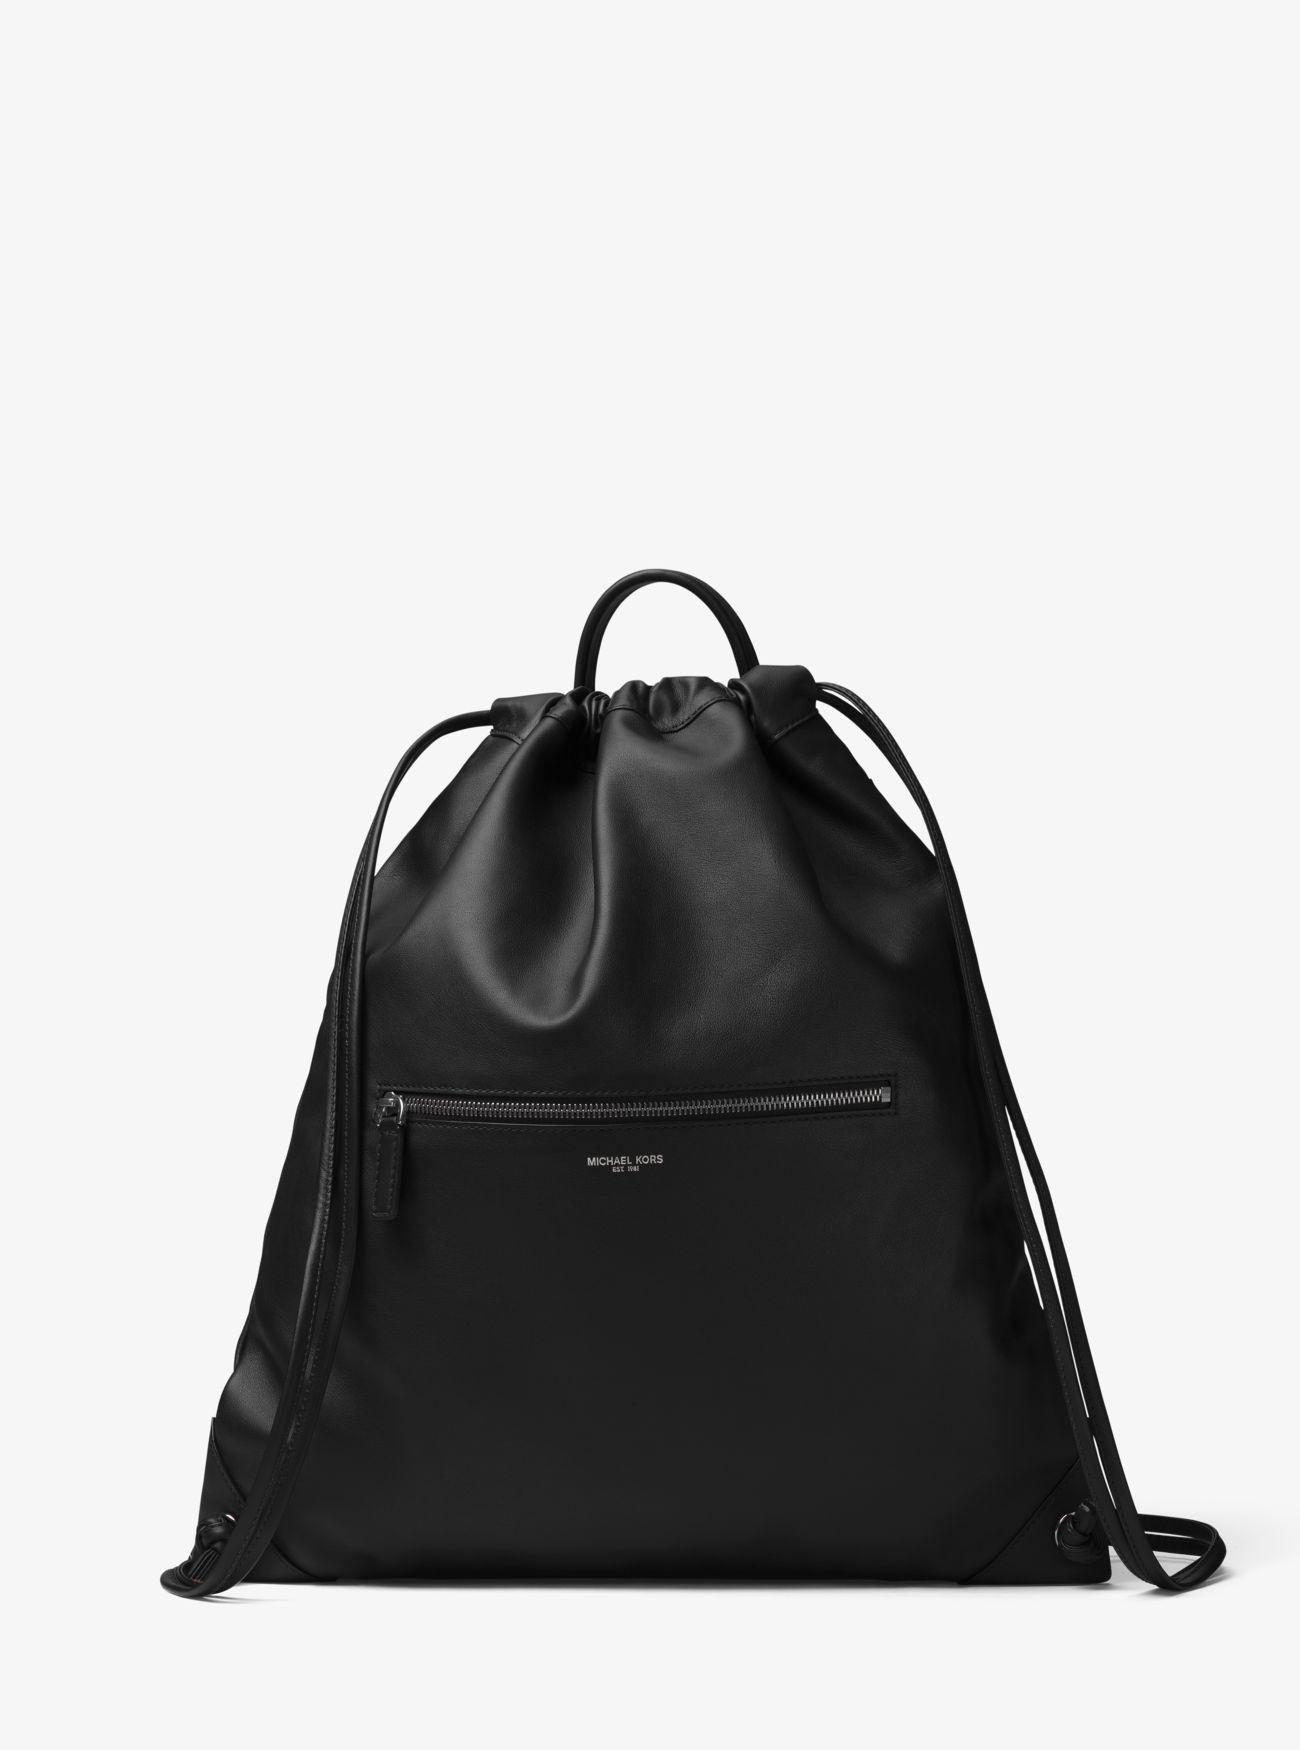 71dd8fc03465ec Michael Kors Dylan Leather Drawstring Backpack in Black for Men - Lyst